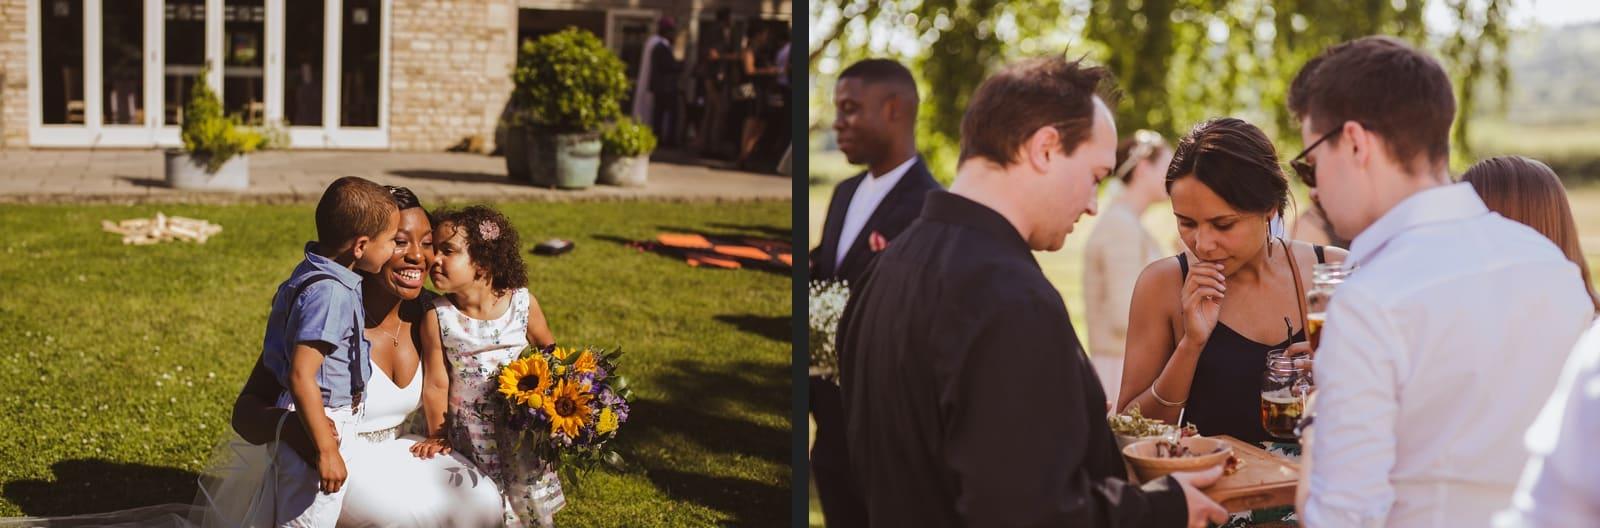 Cotswolds Wedding Photographer 0096